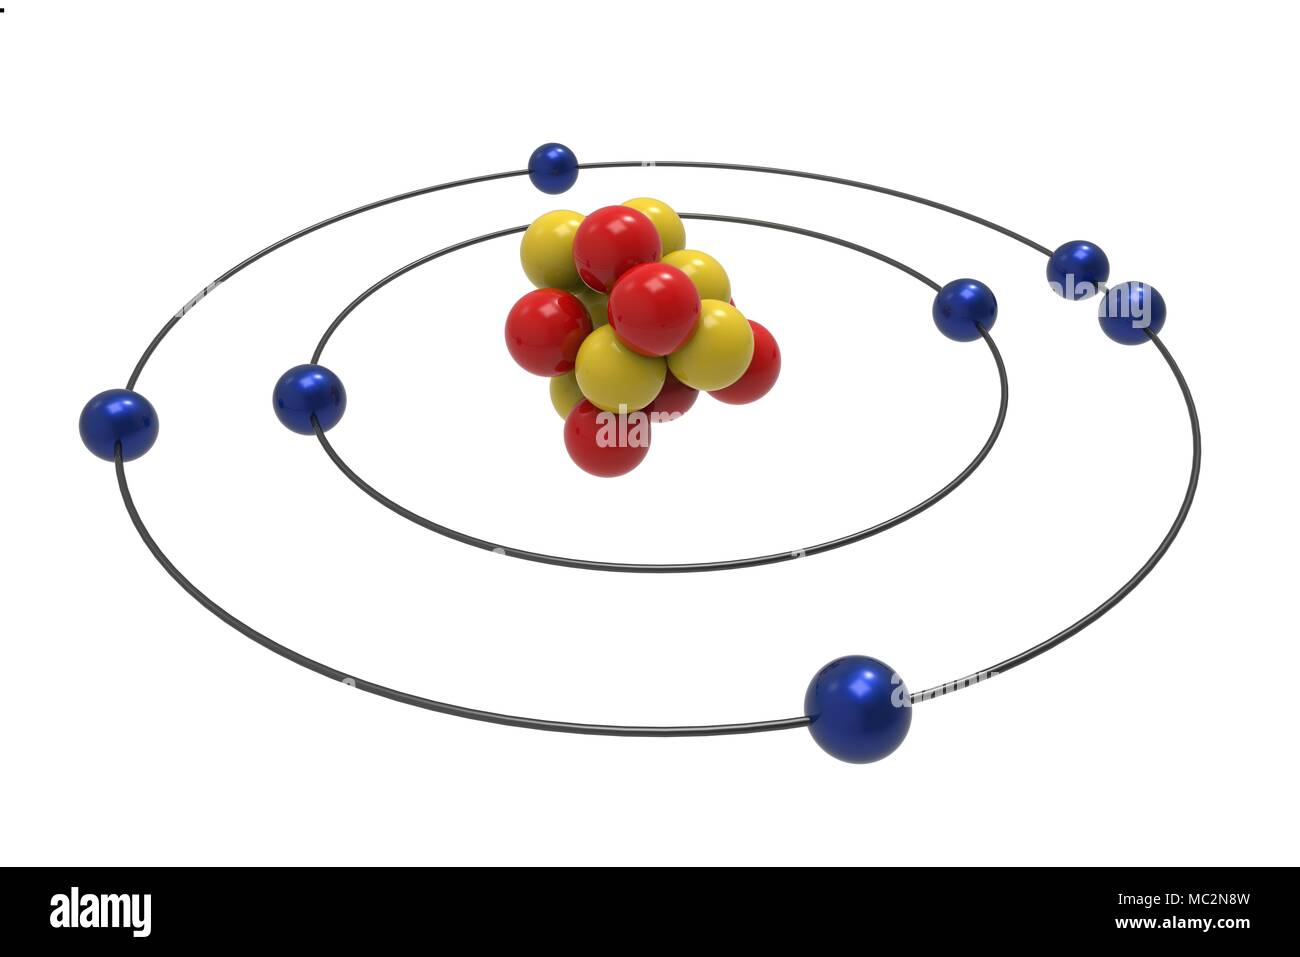 Bohr Model Of Nitrogen Atom With Proton  Neutron And